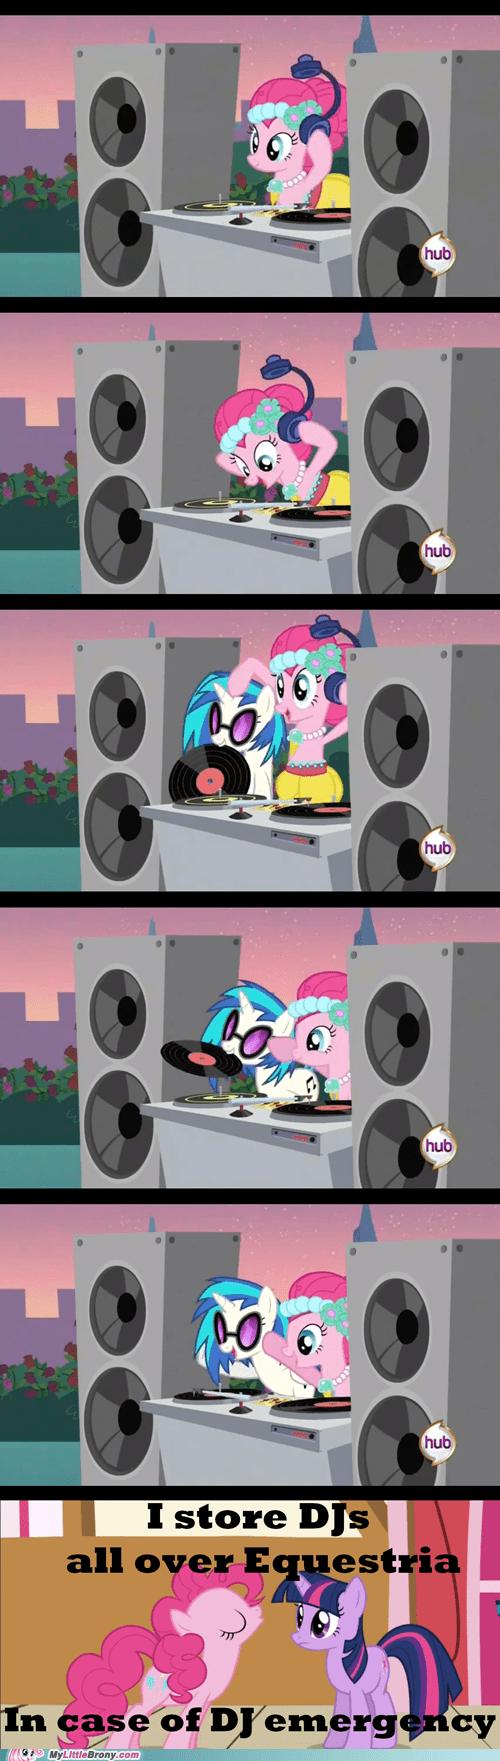 comics dj PON-3 emergency ending Music pinkie pie season 2 - 6155175168